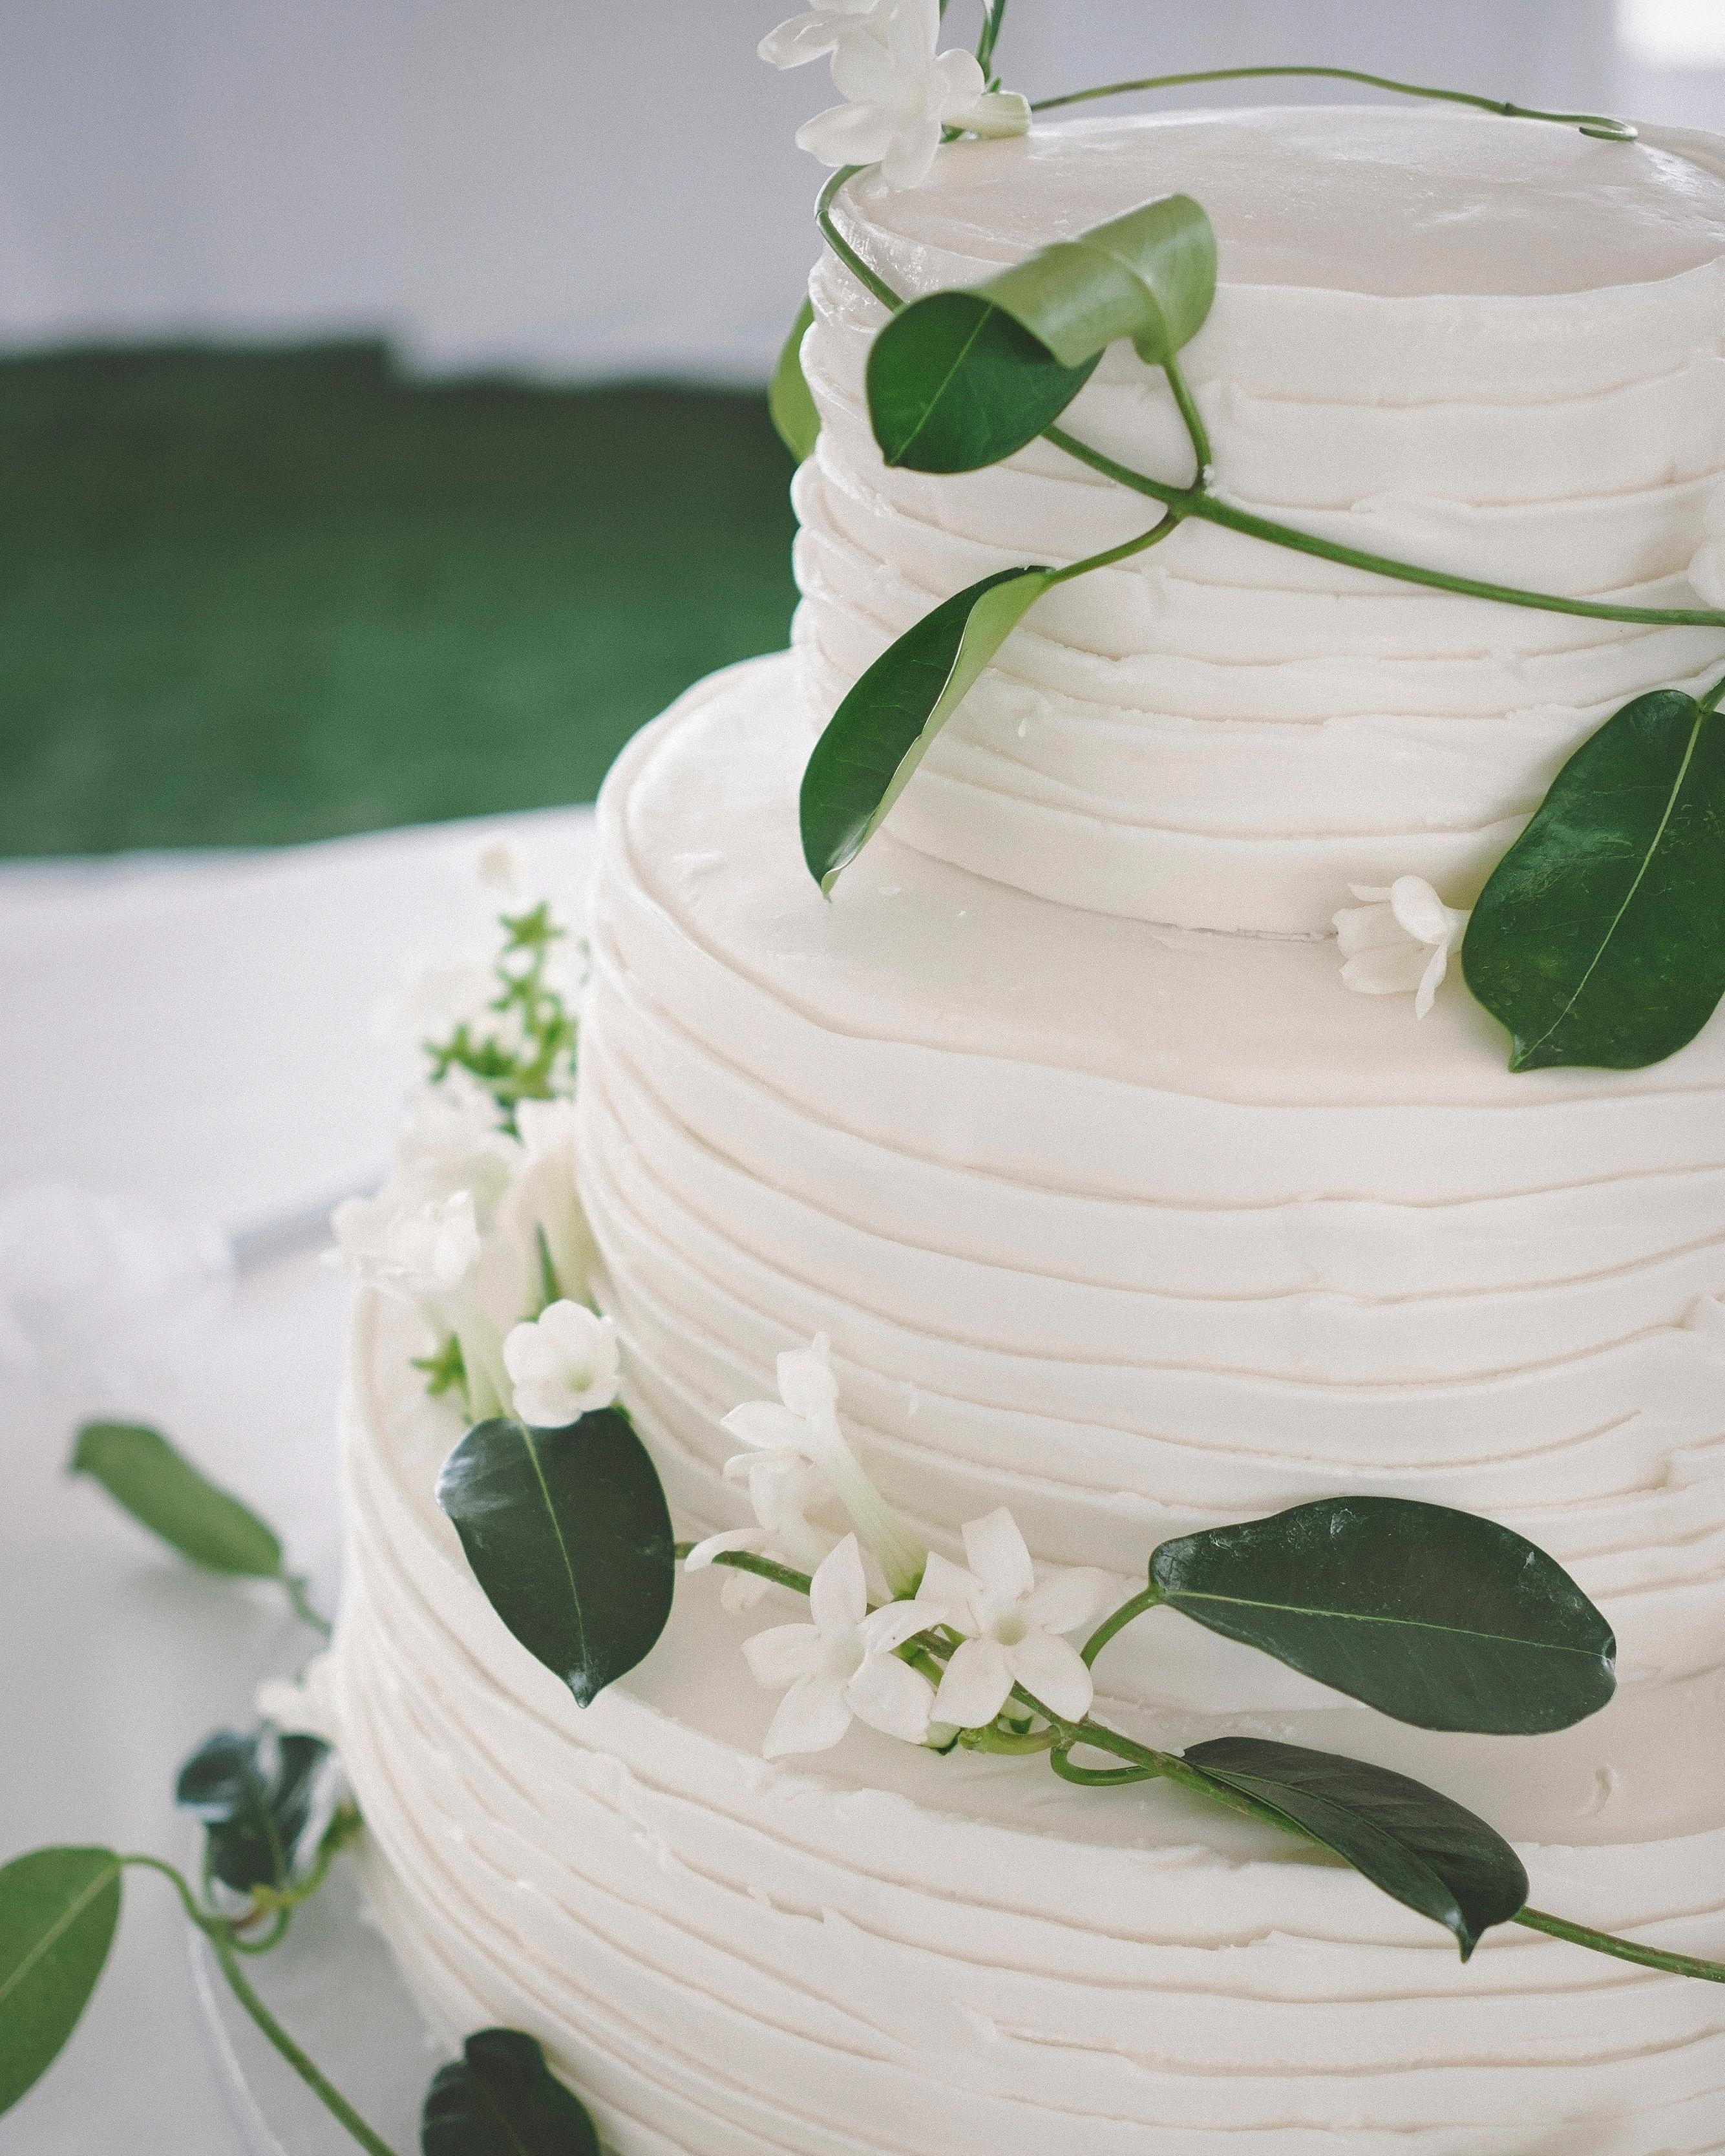 molly-greg-wedding-cake-00028-s111481-0814.jpg